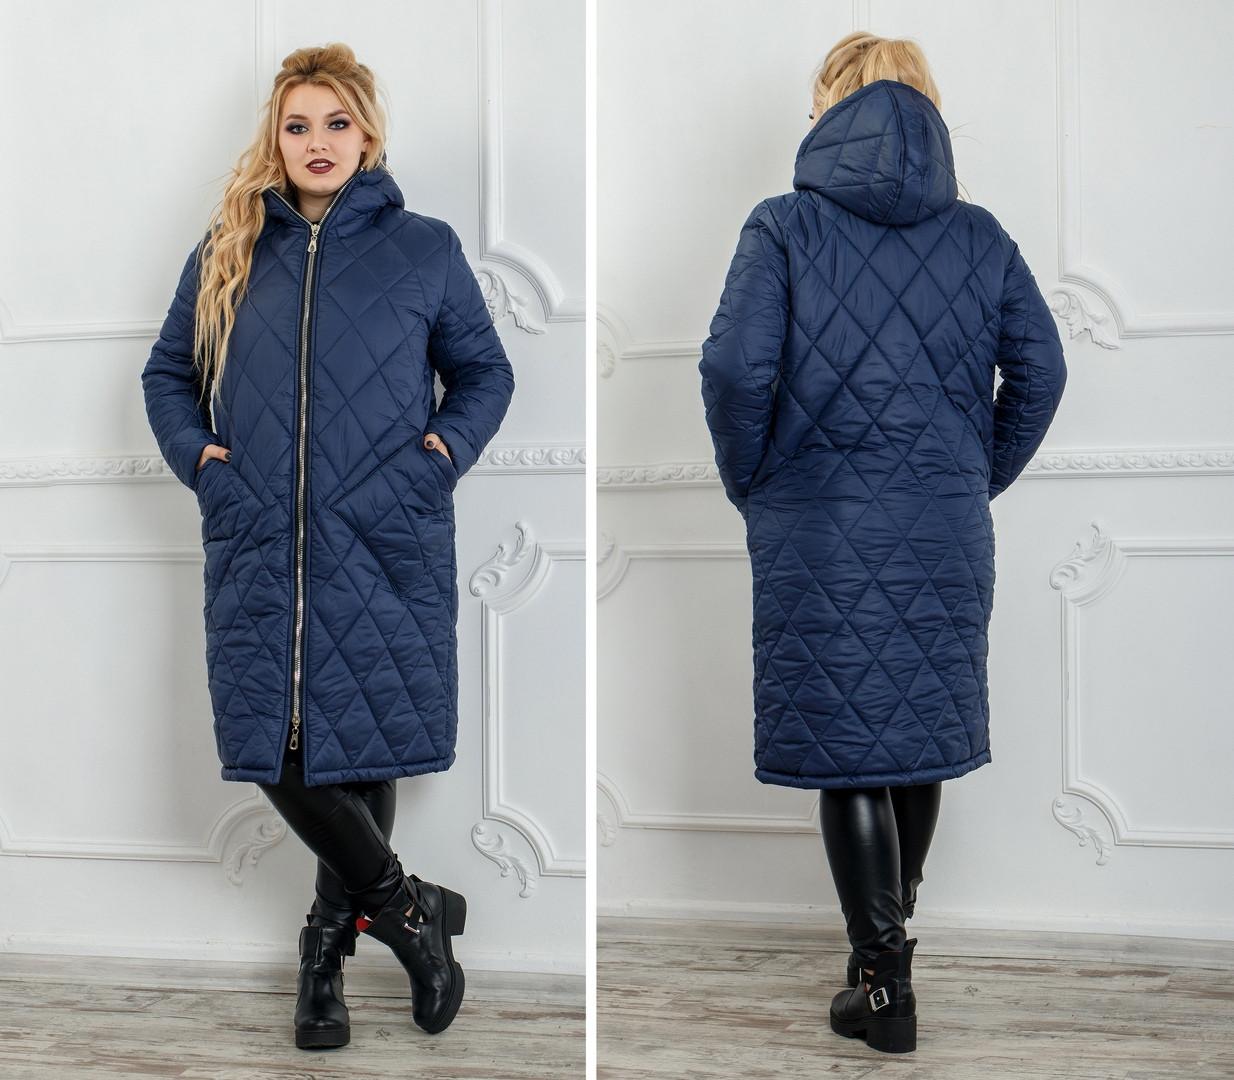 16895a2a8aa Зимнее теплое пальто плащевка стеганная на синтепоне+подкладка Размер  50-52